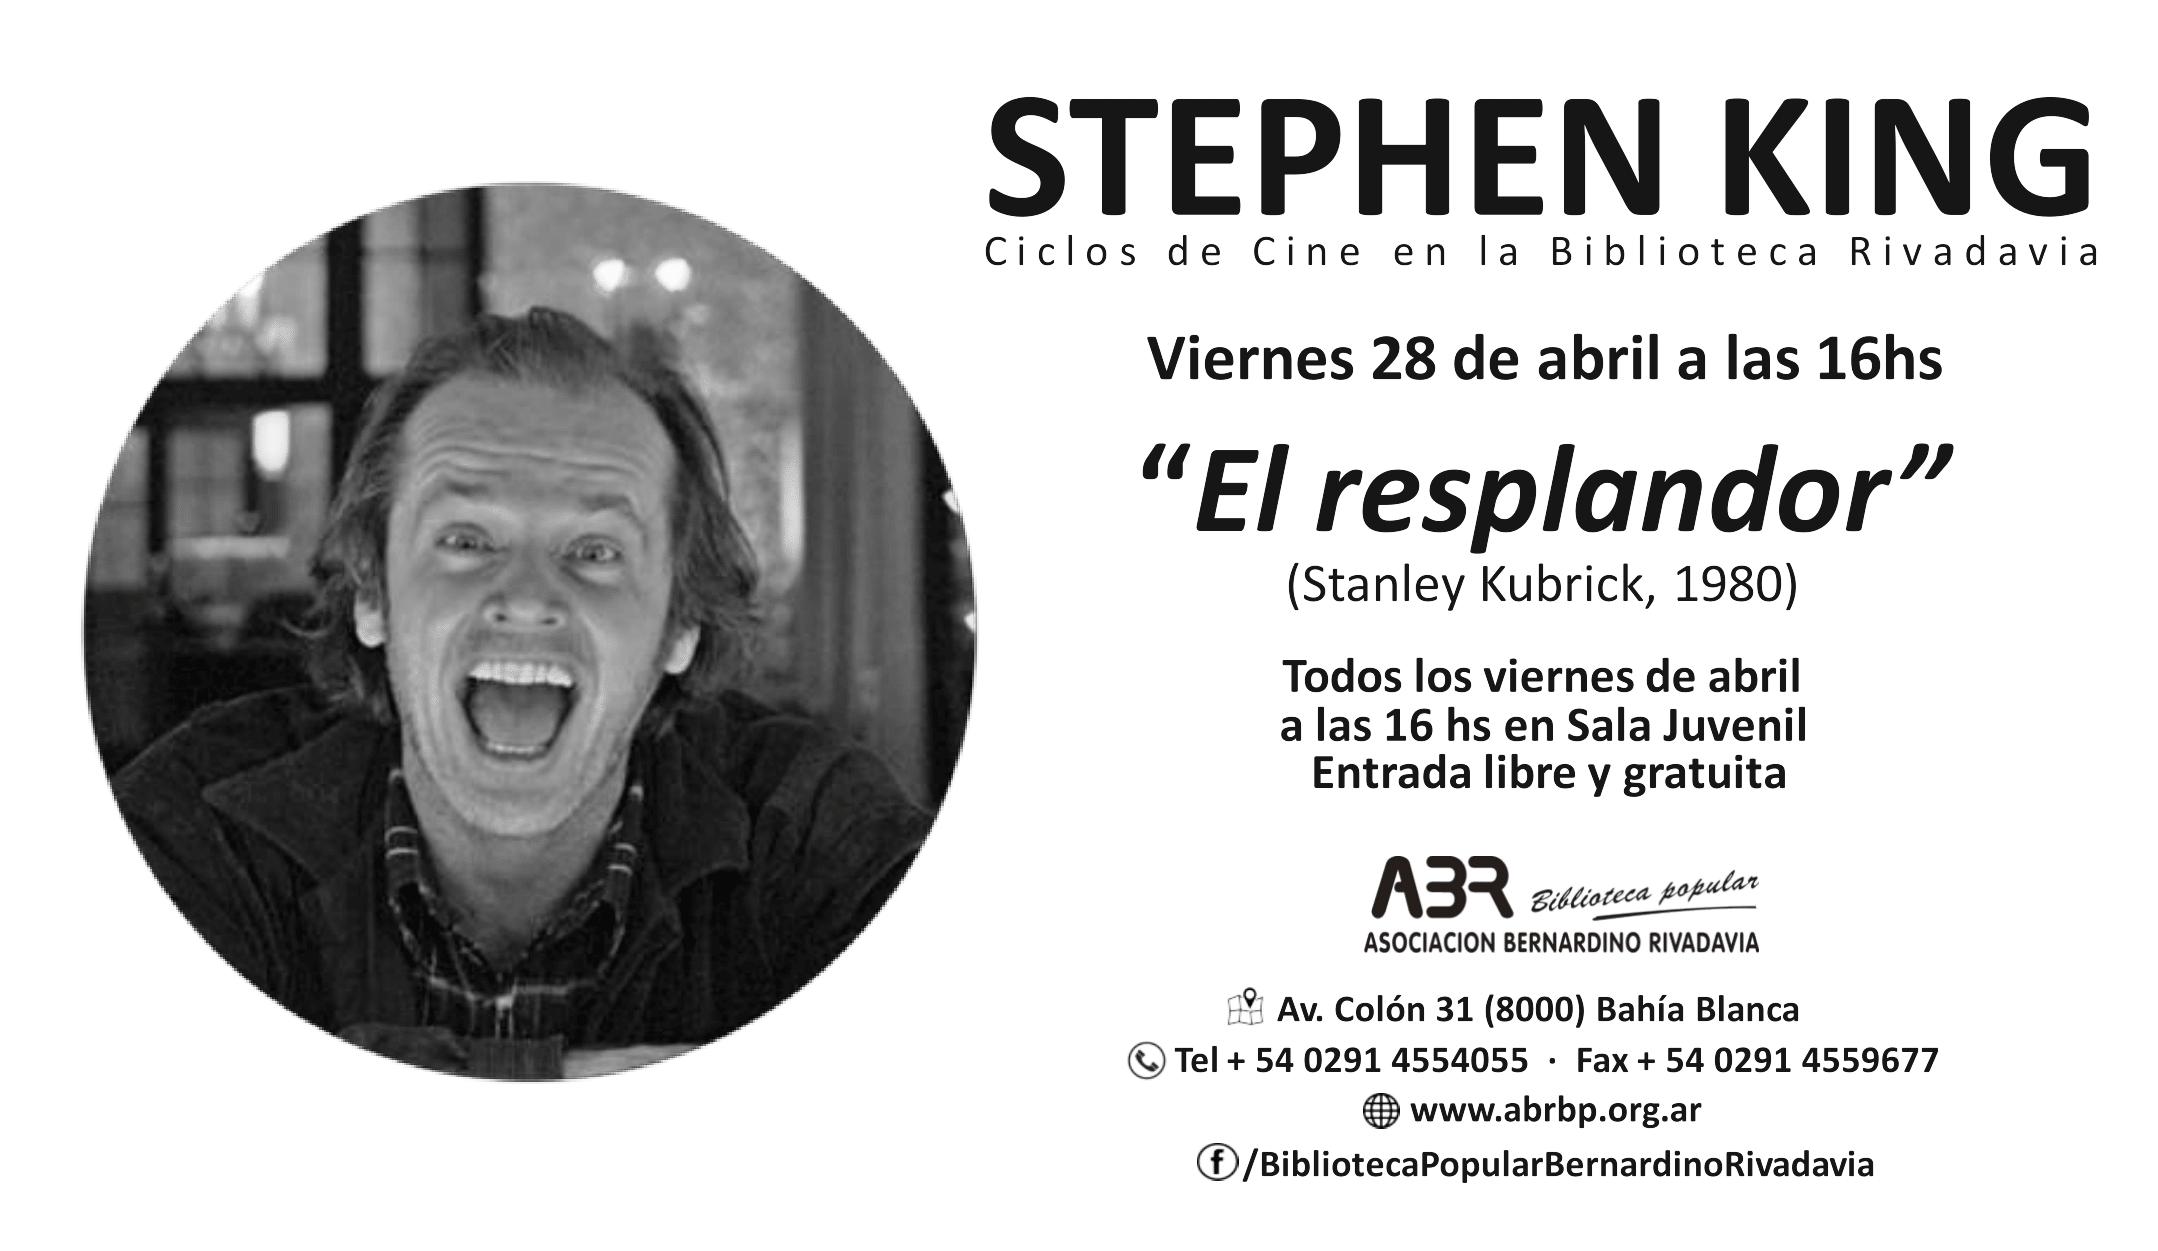 Stephen King Carrie - El resplandor